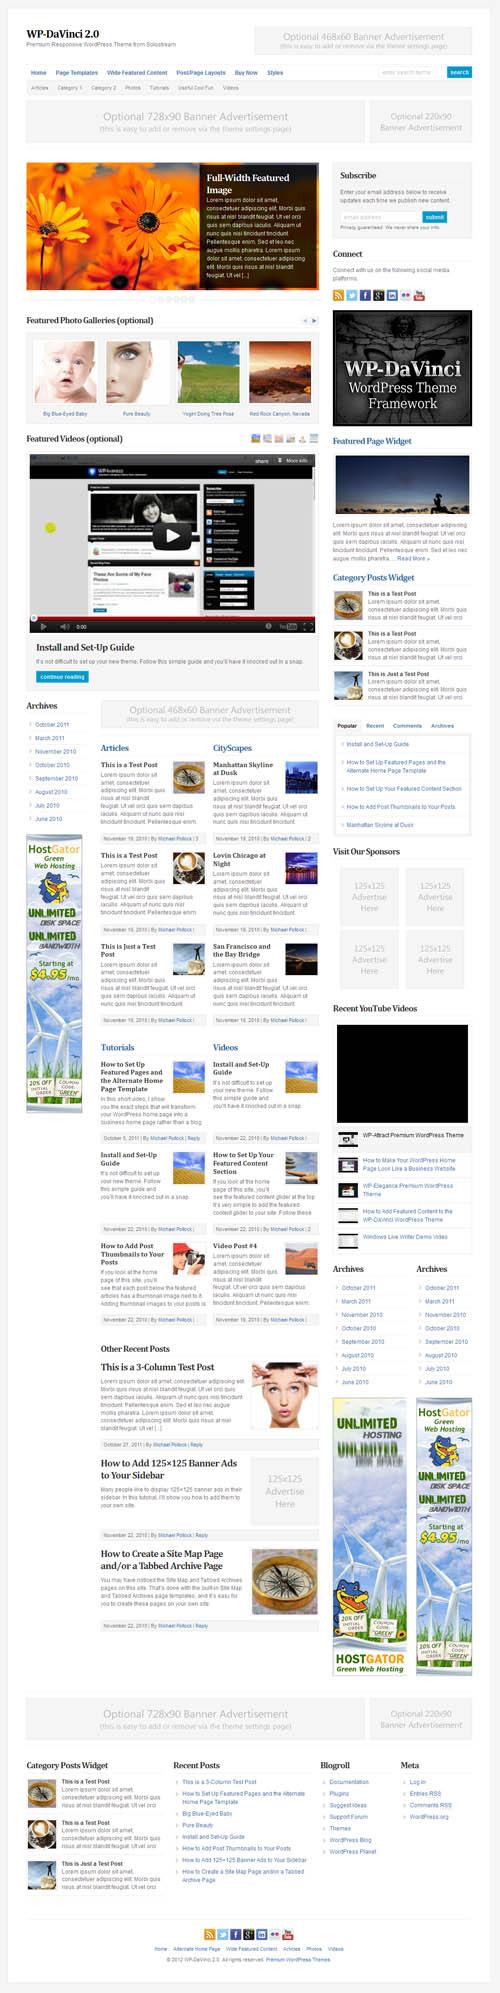 DaVinci 2.0 Premium WordPress Theme